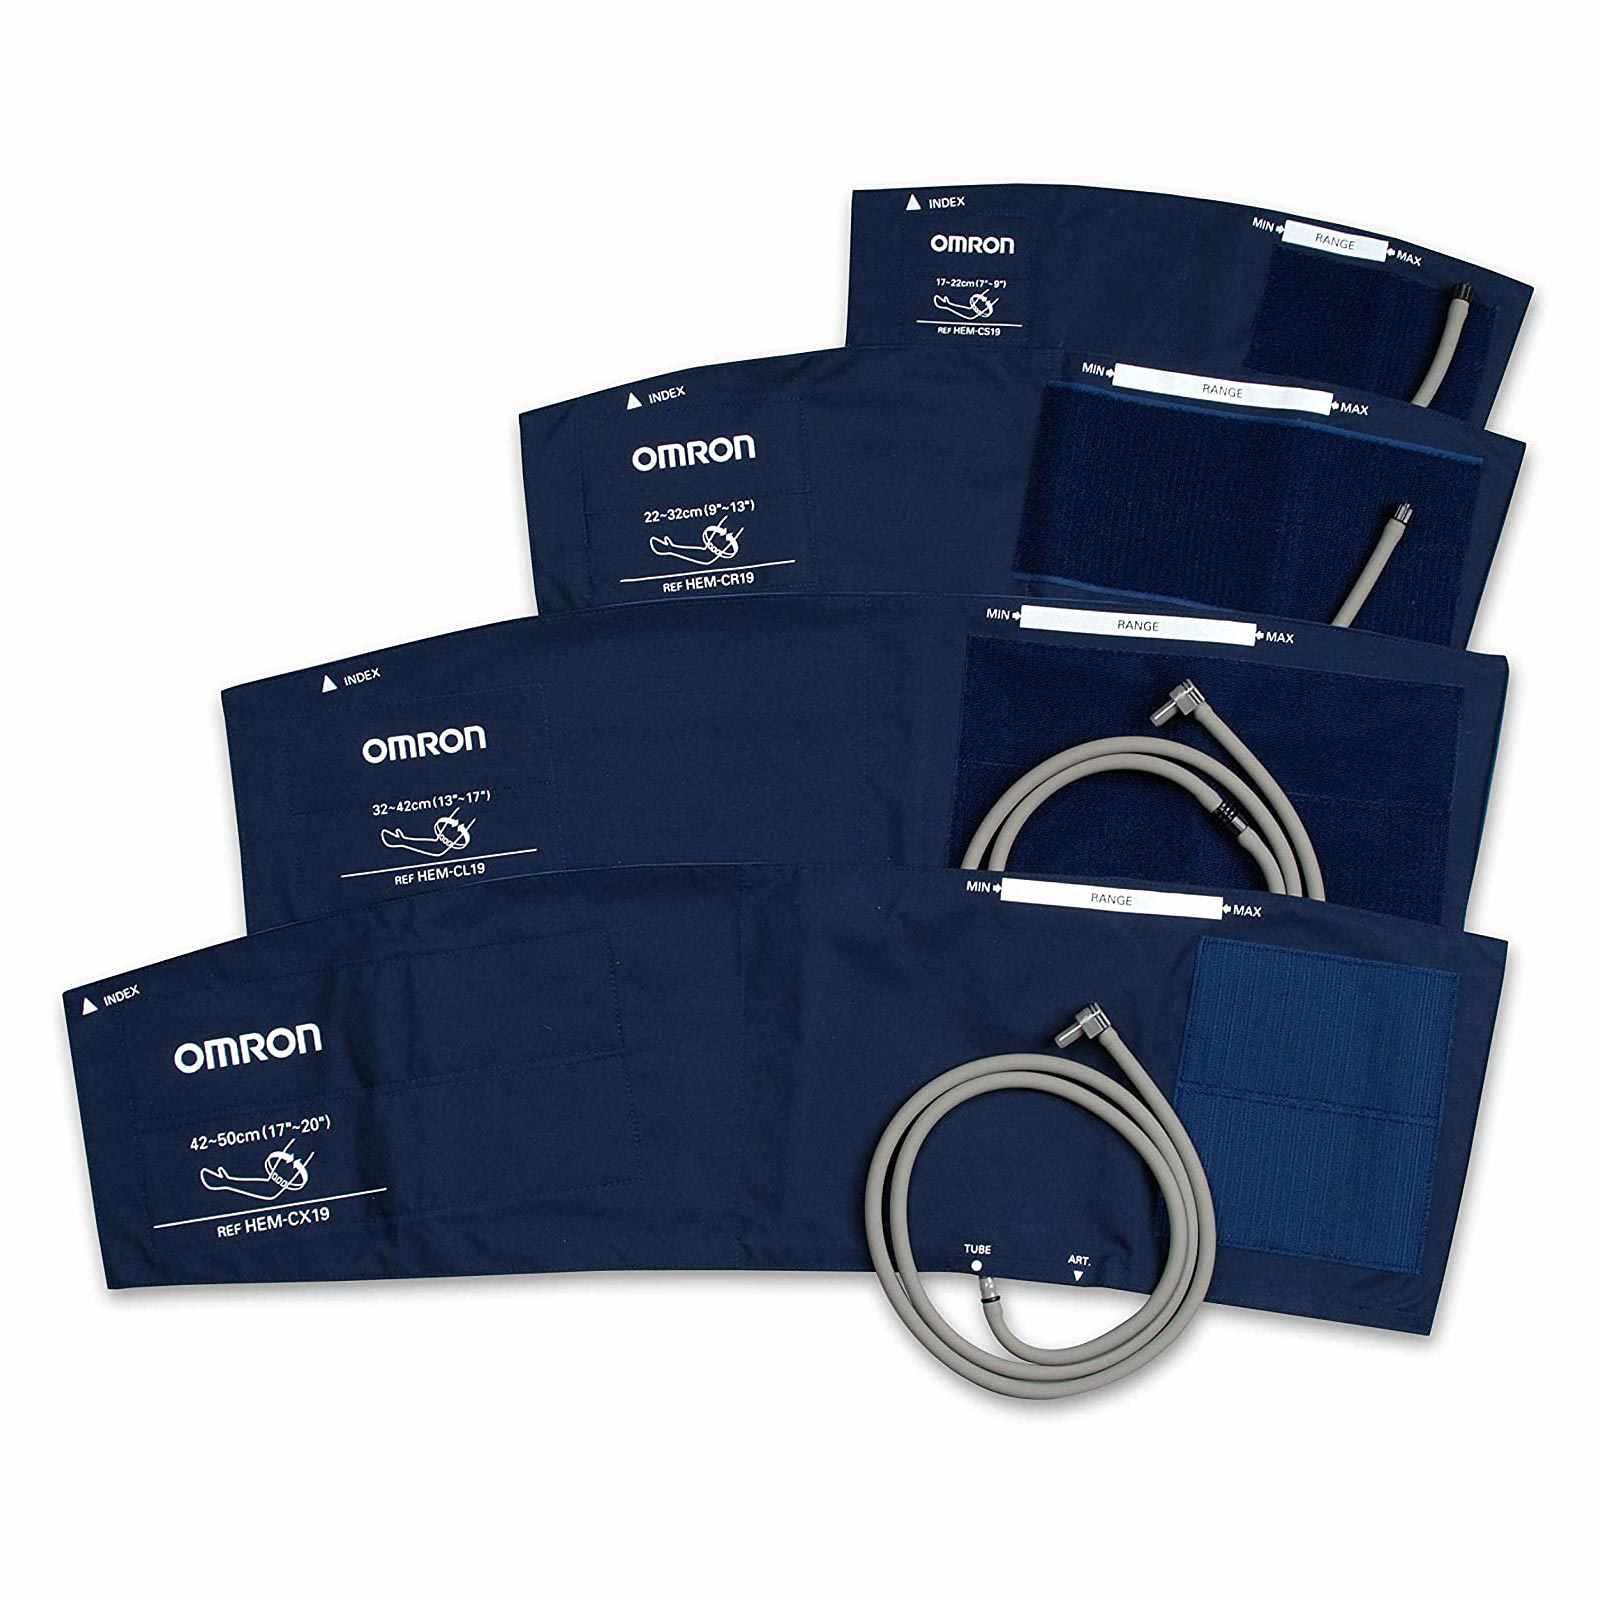 Omron Healthcare IntelliSense Blood Pressure Cuff Adult Arm